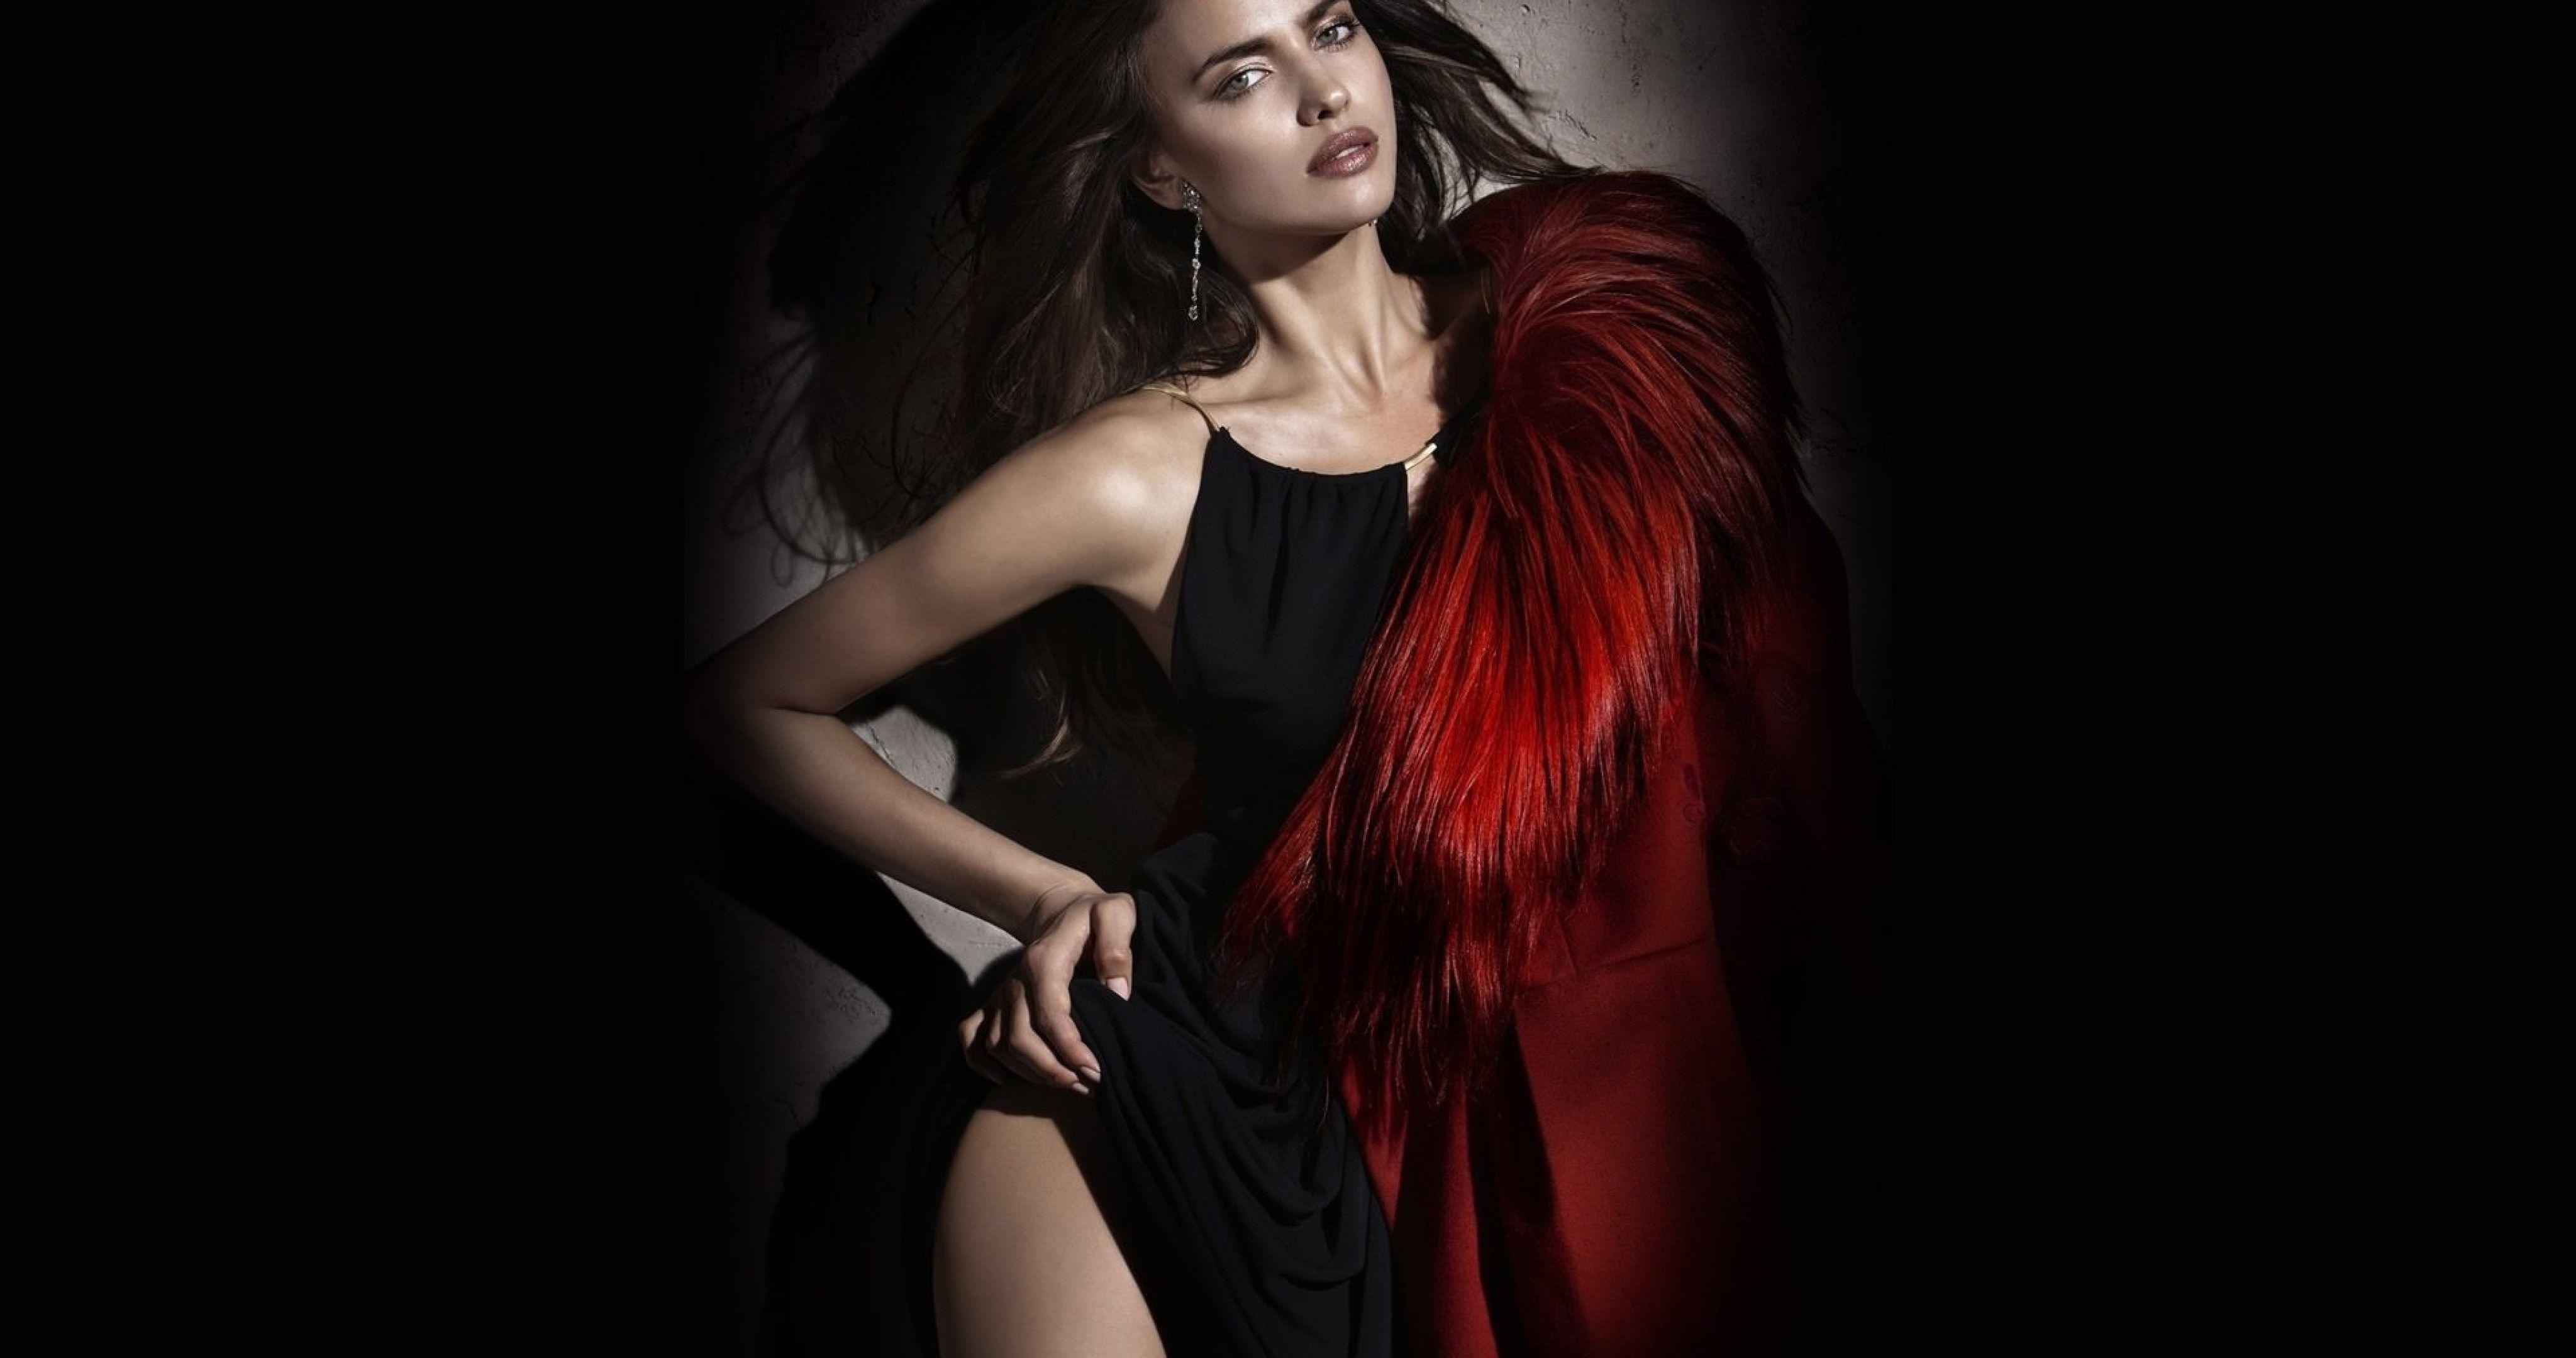 irina sheik wallpaper 4k ultra hd wallpaper Fur fashion